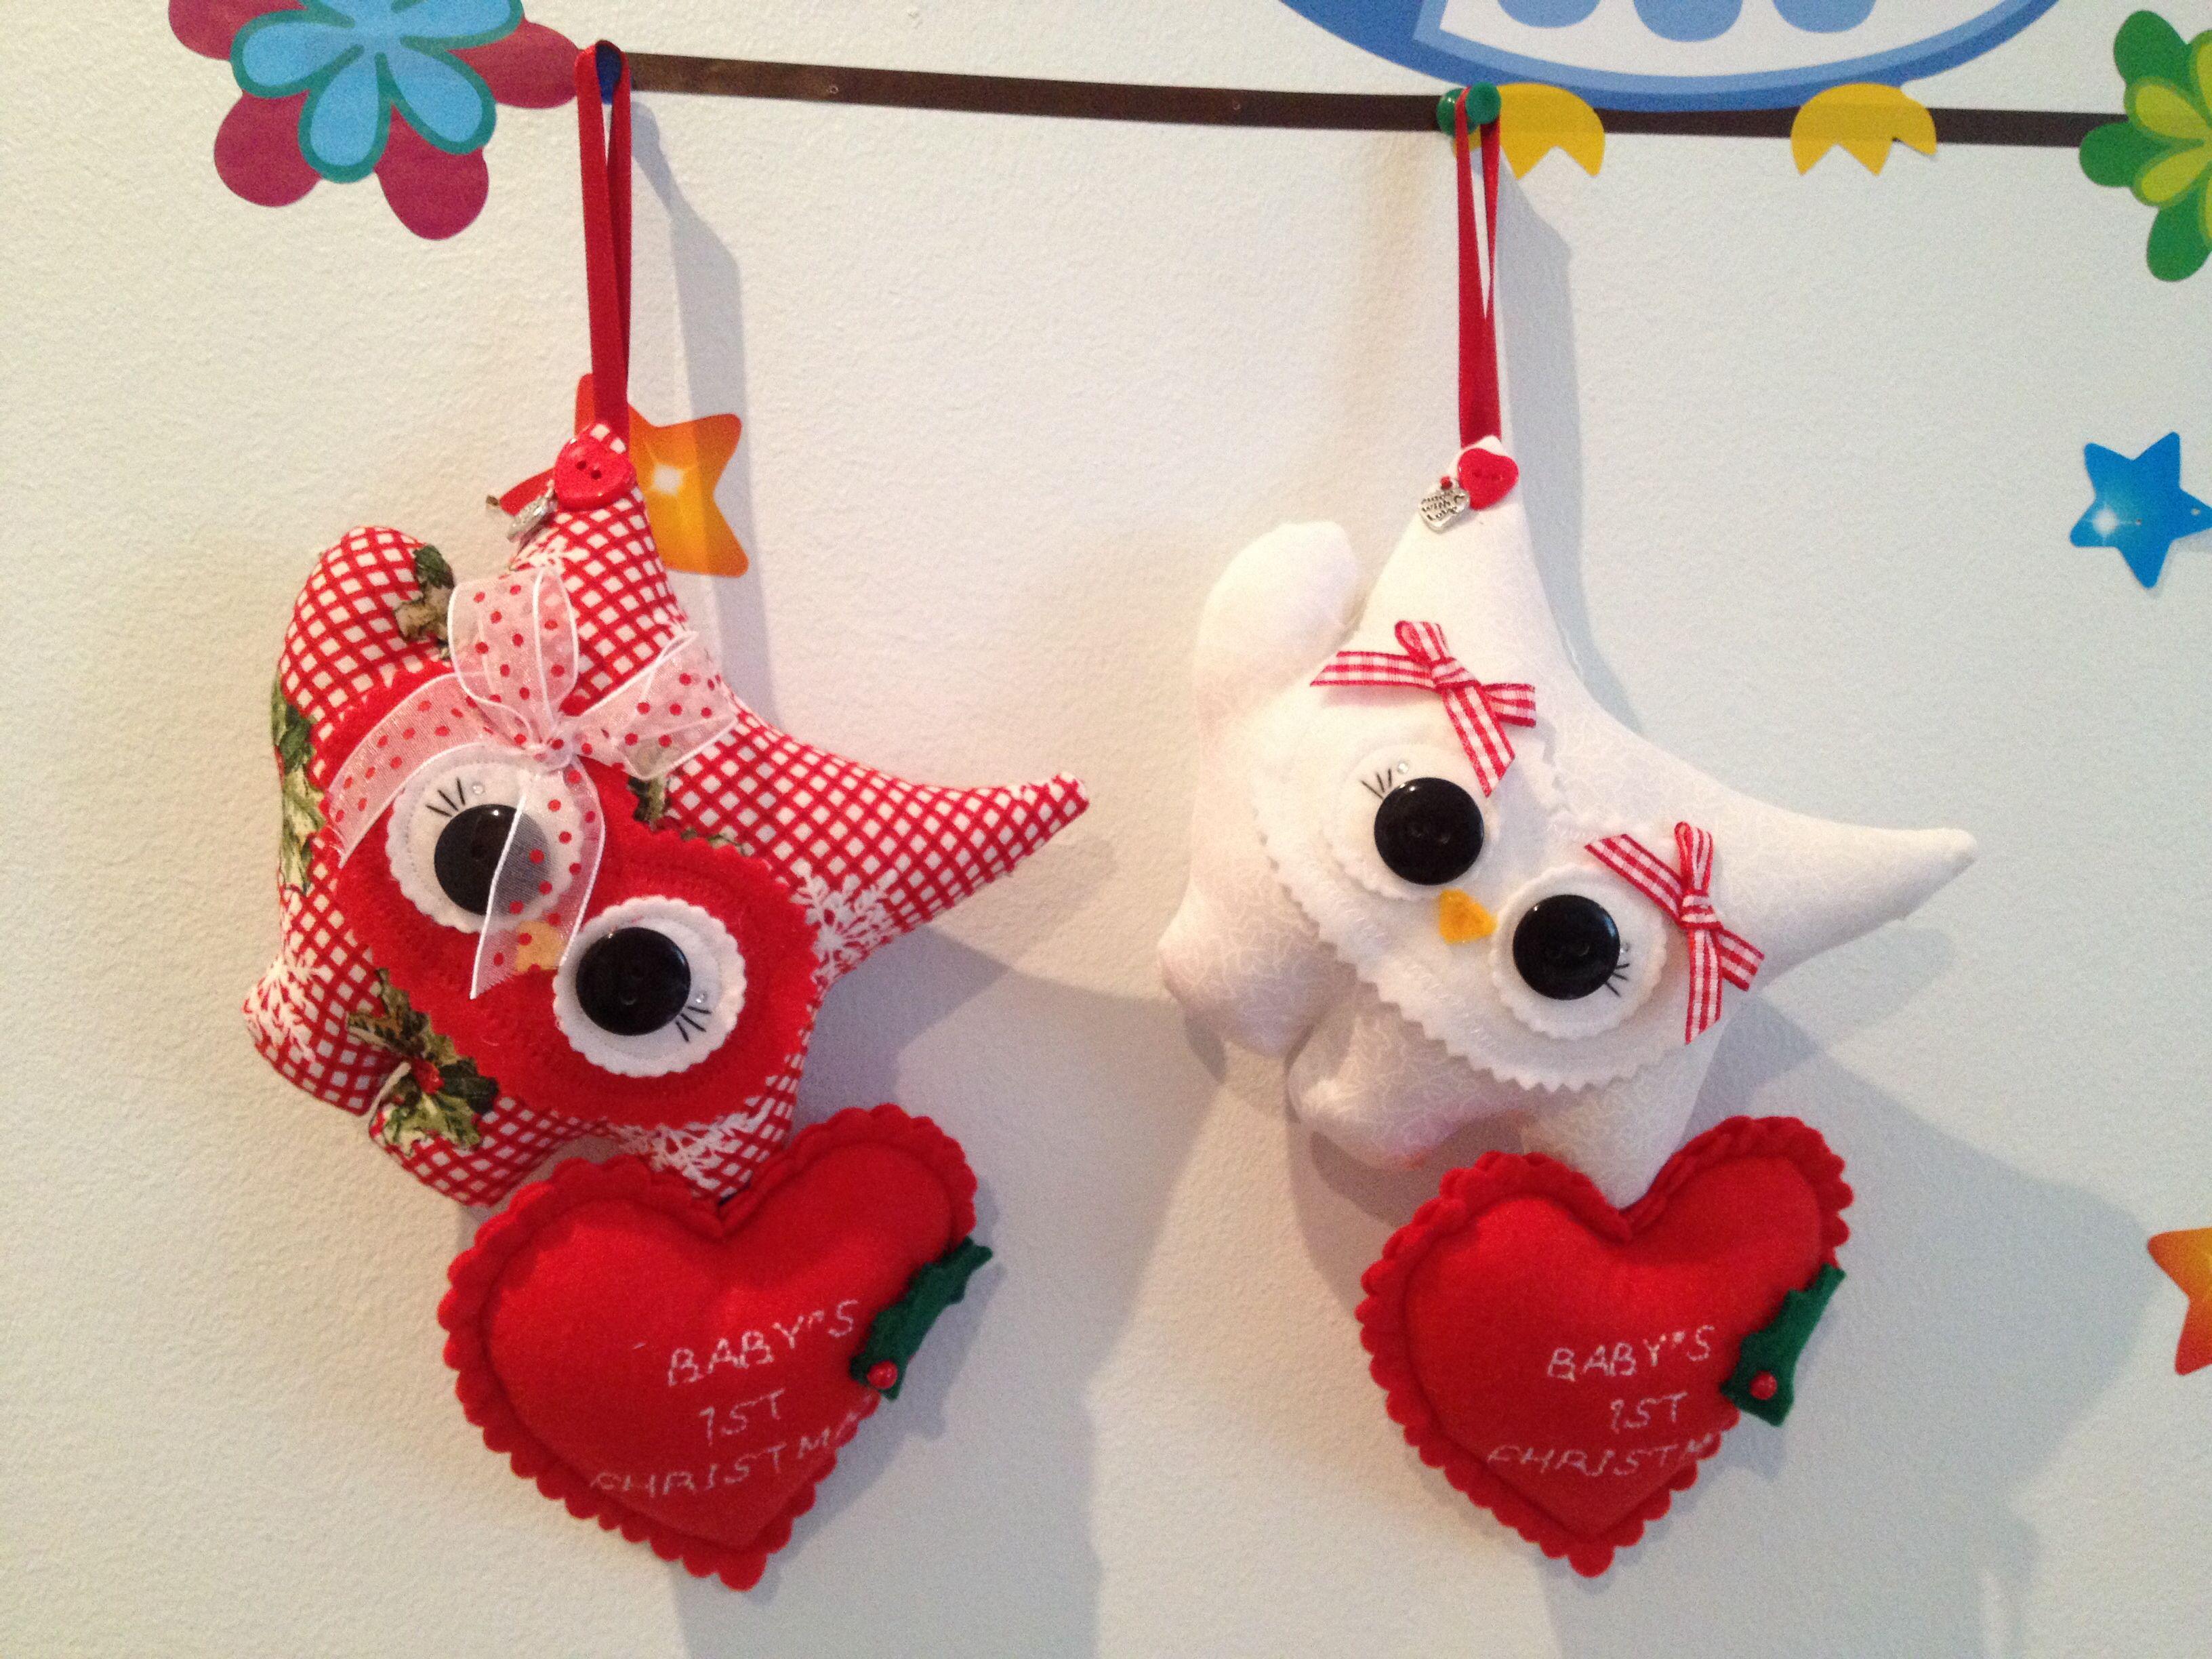 ❤️ 2 beautiful bespoke ❤️ Baby's First Christmas ❤️ Hoots of Love ❤️